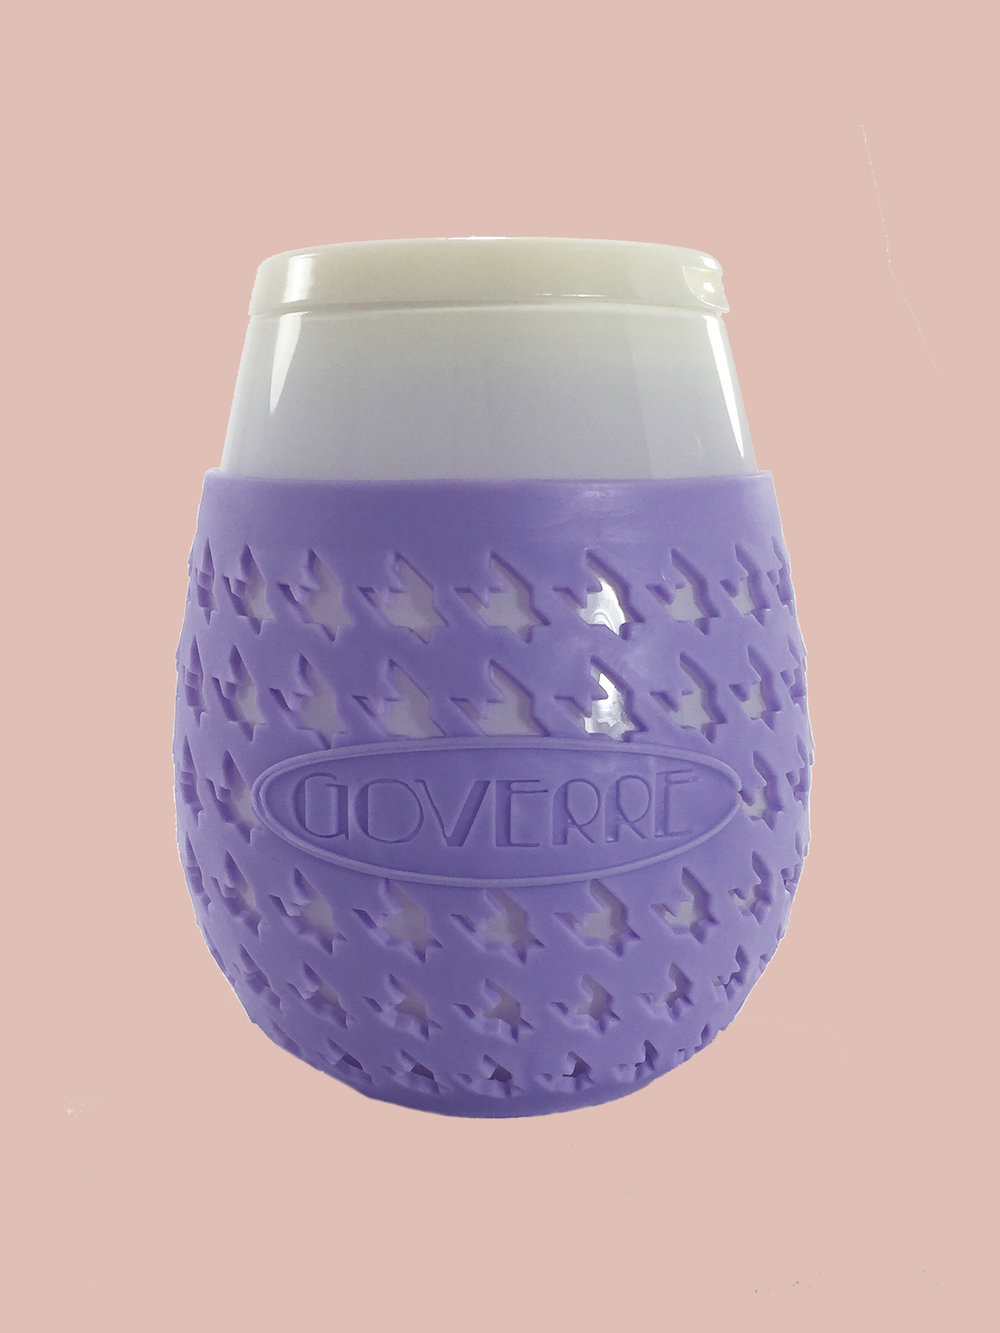 SaltSupply_lavender goverre.jpg